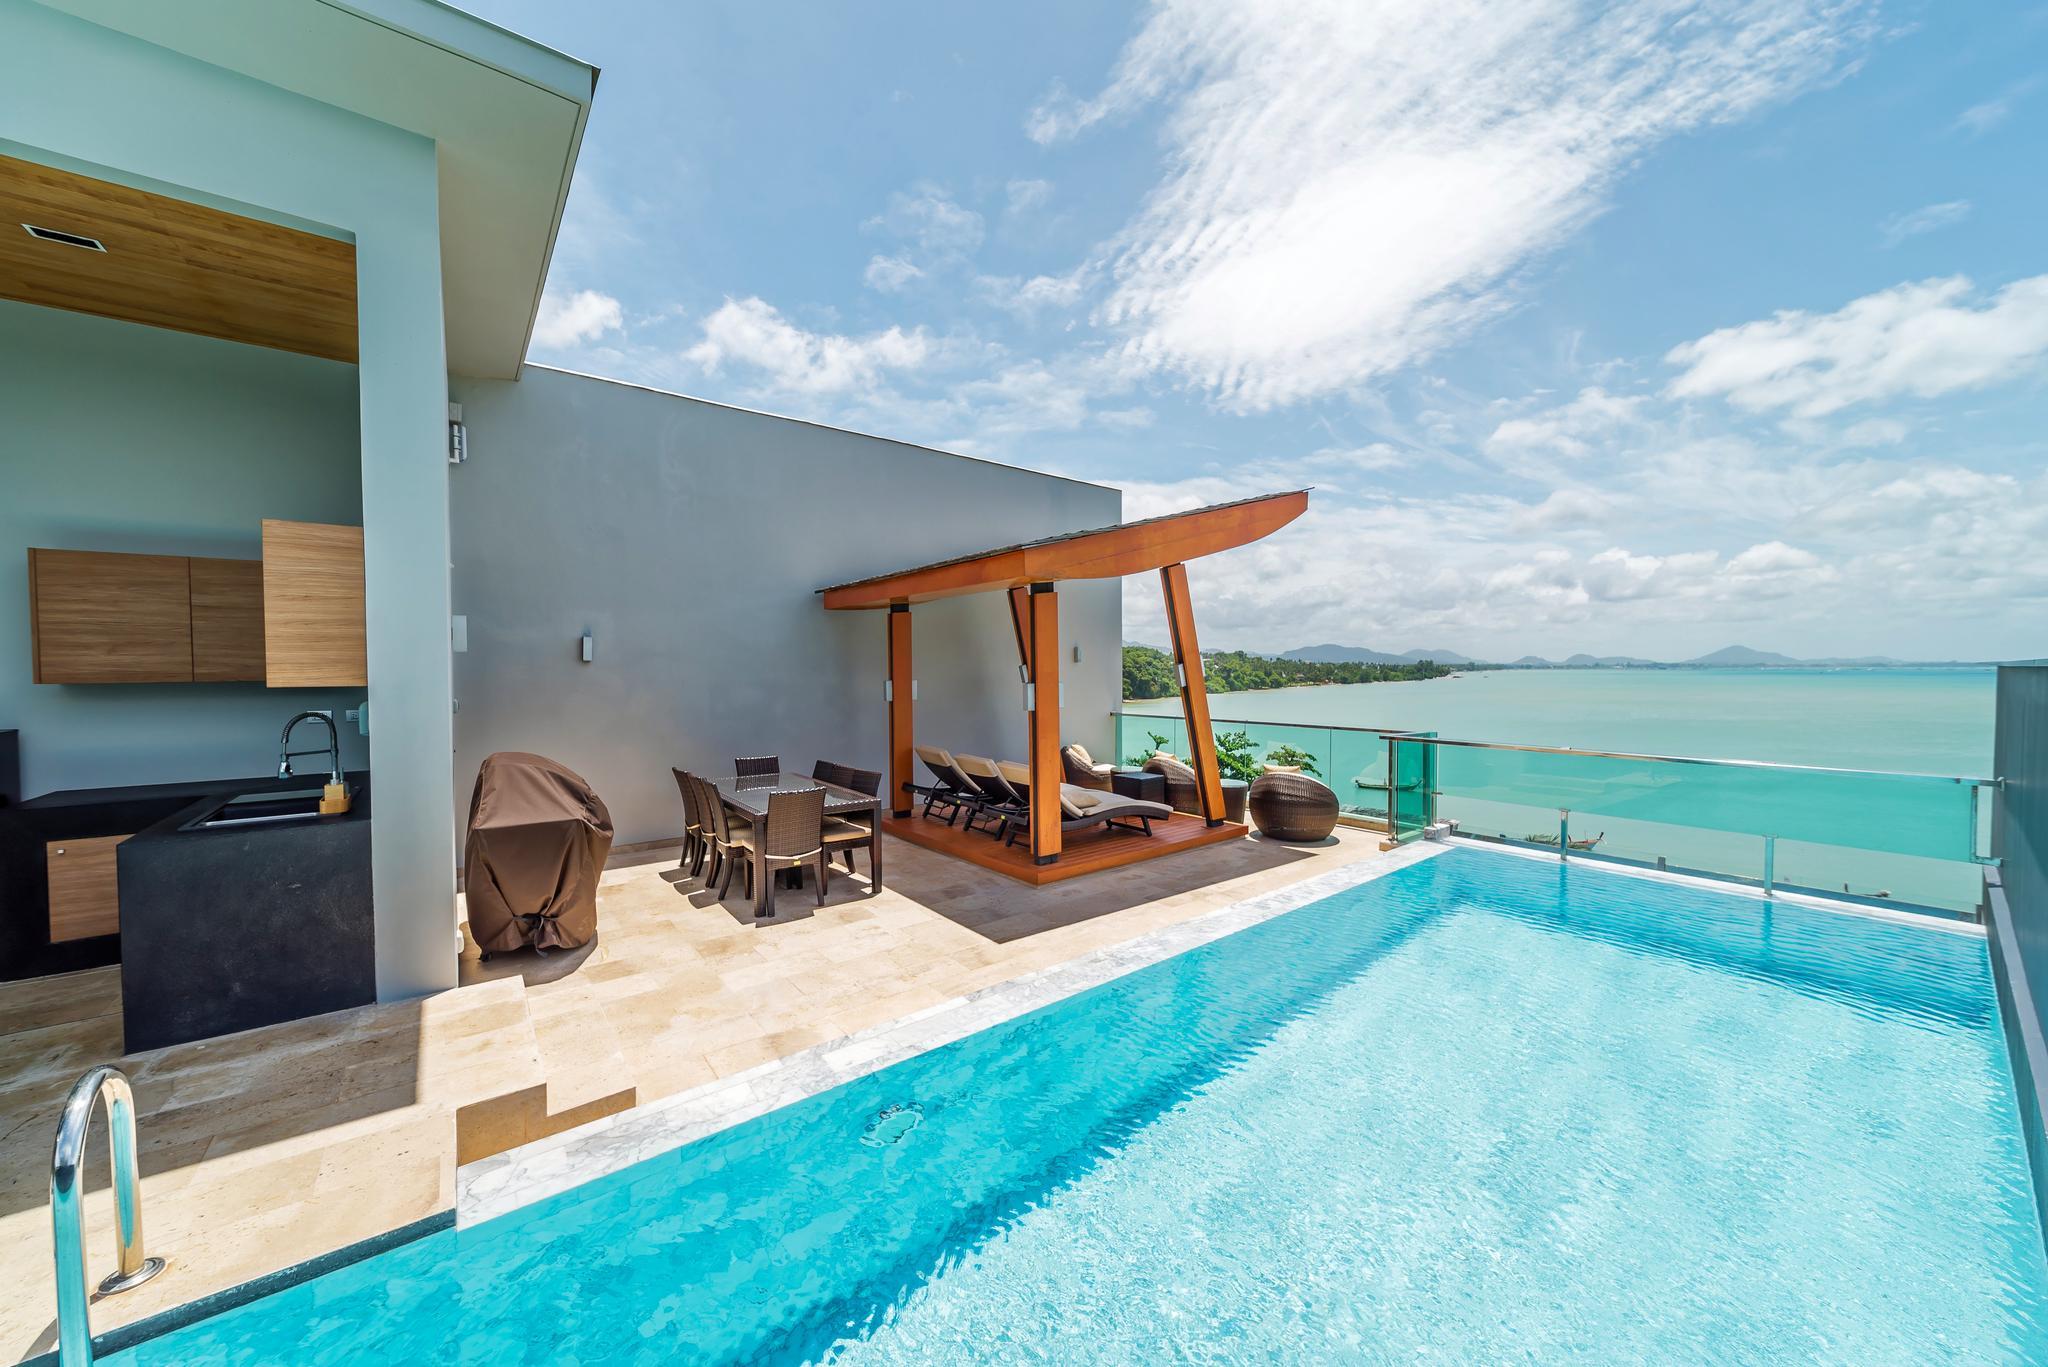 Elemental 5FL Infinity Pool Seafront Villas